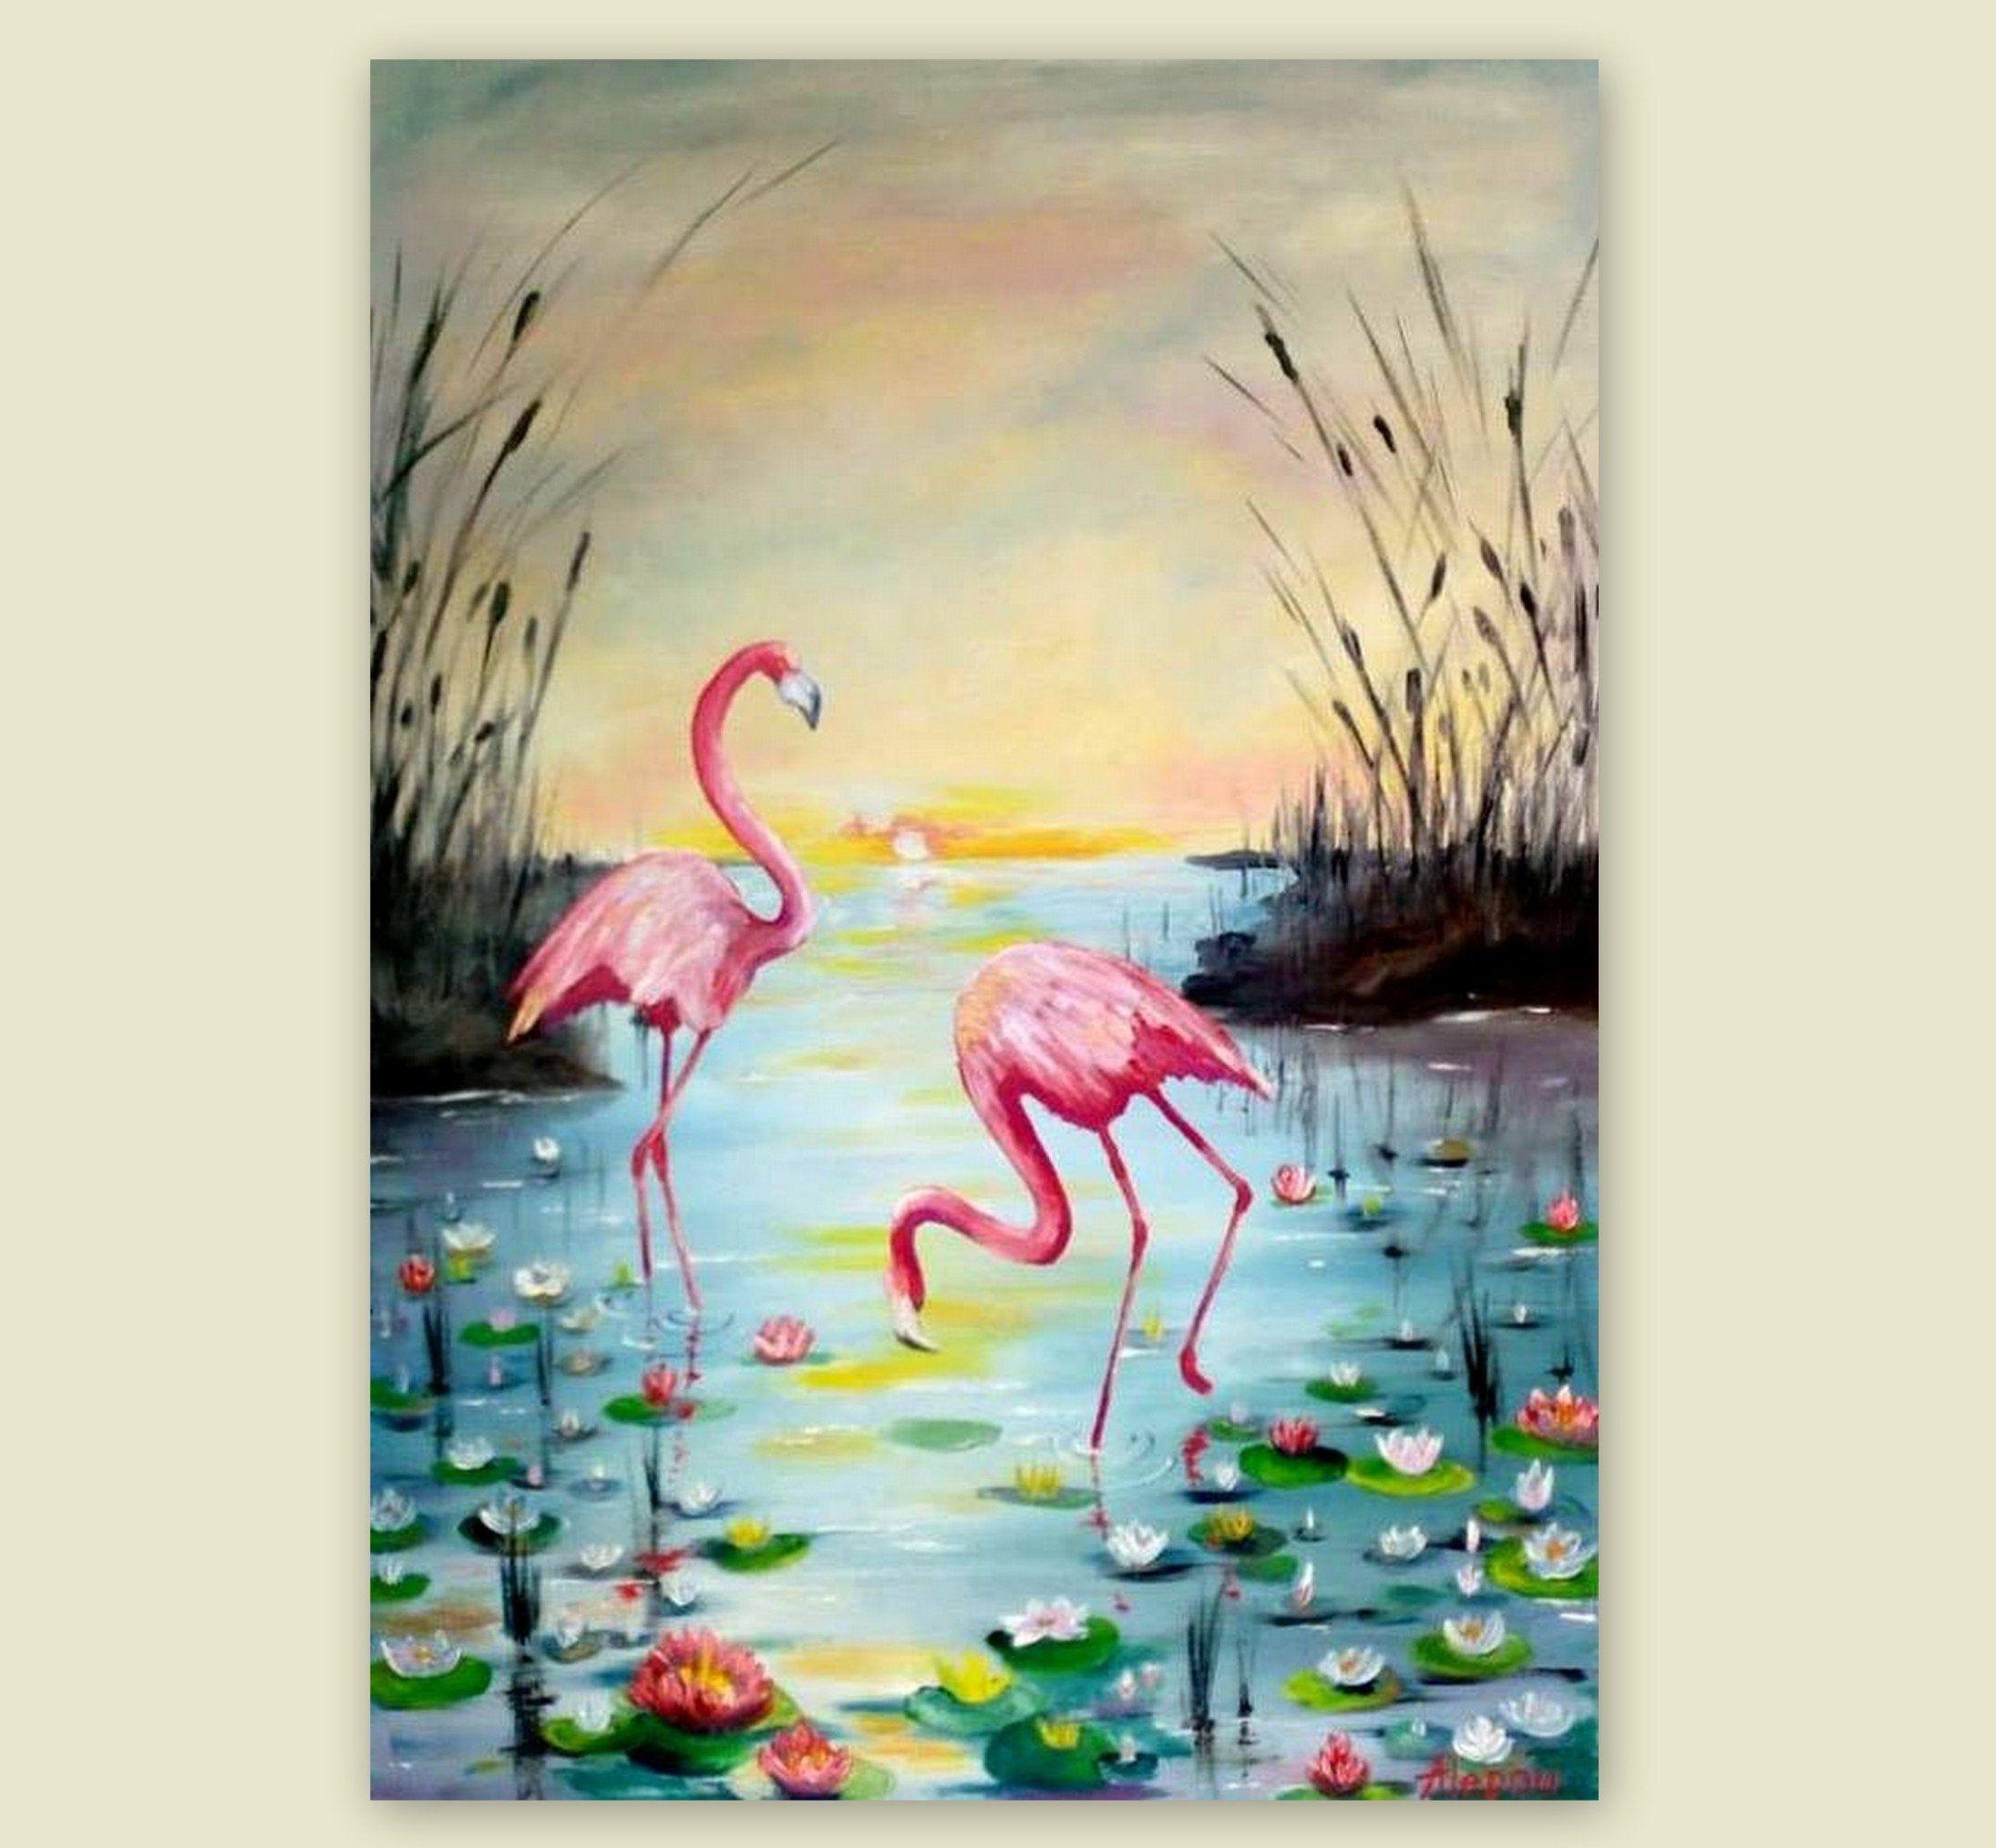 Pink Flamingo Original Oil Painting Colorful Canvas Wall Etsy Original Oil Painting Etsy Wall Art Peacock Painting